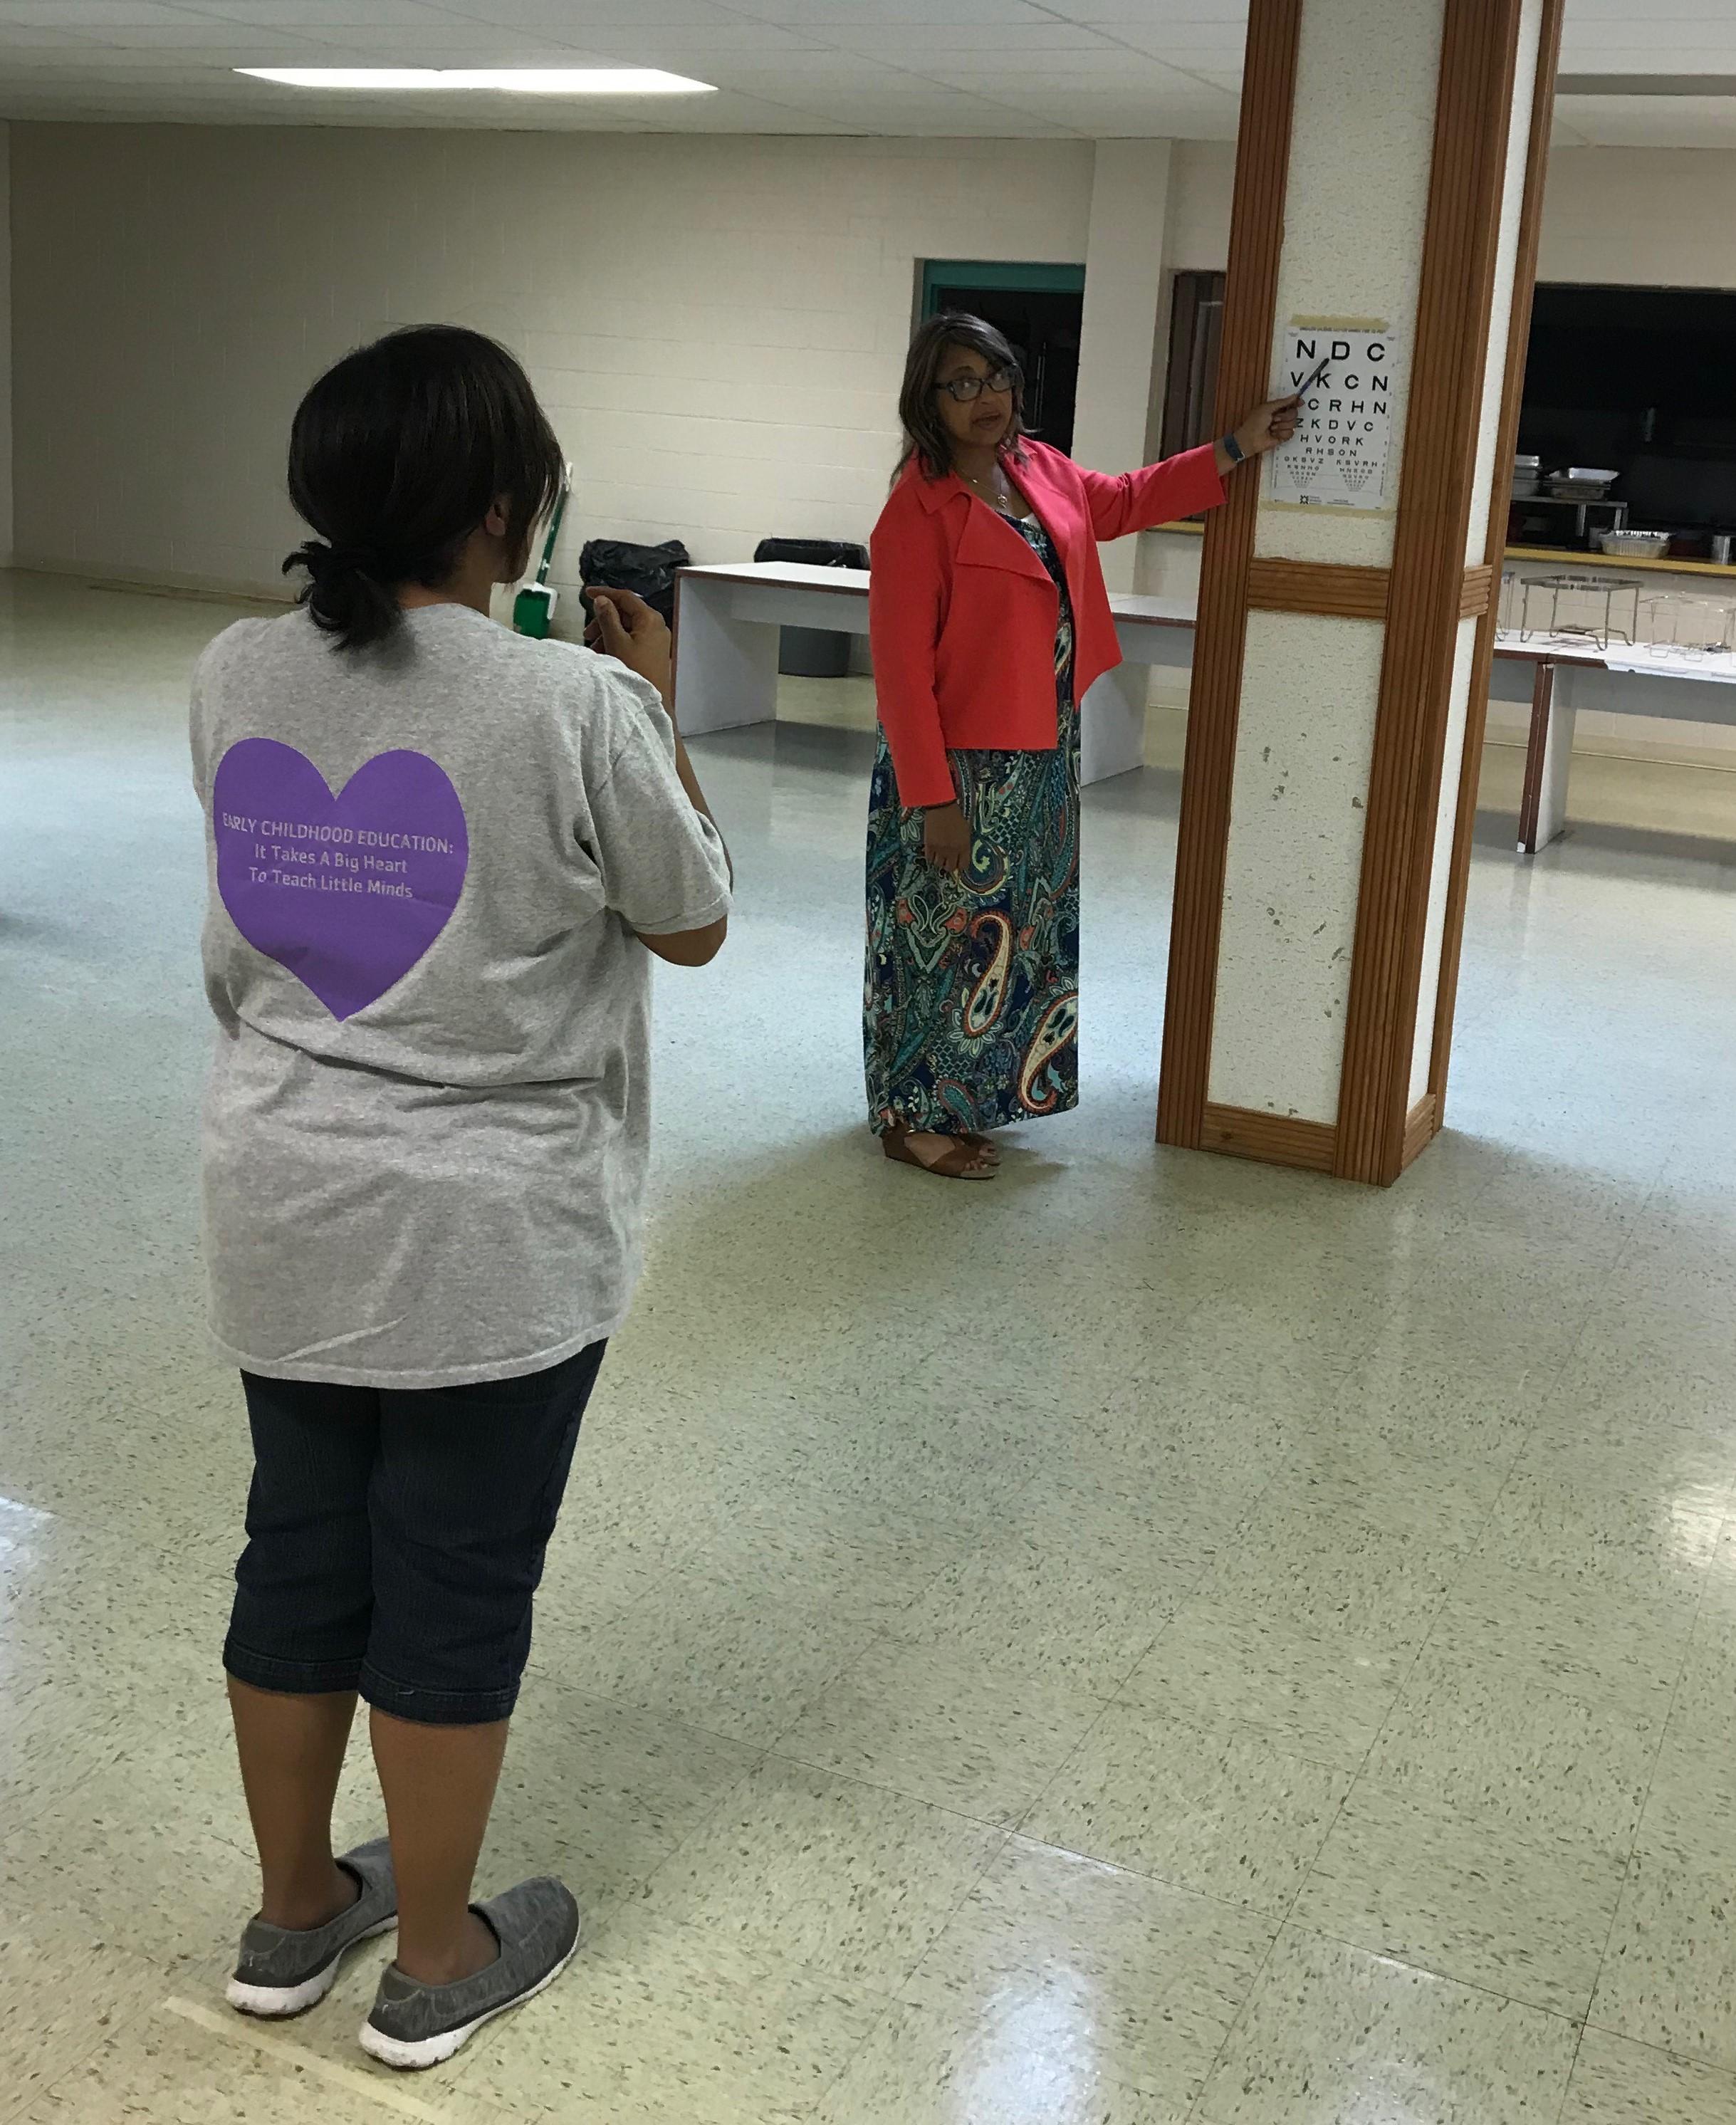 Mt. Zion Adult Training Snellen